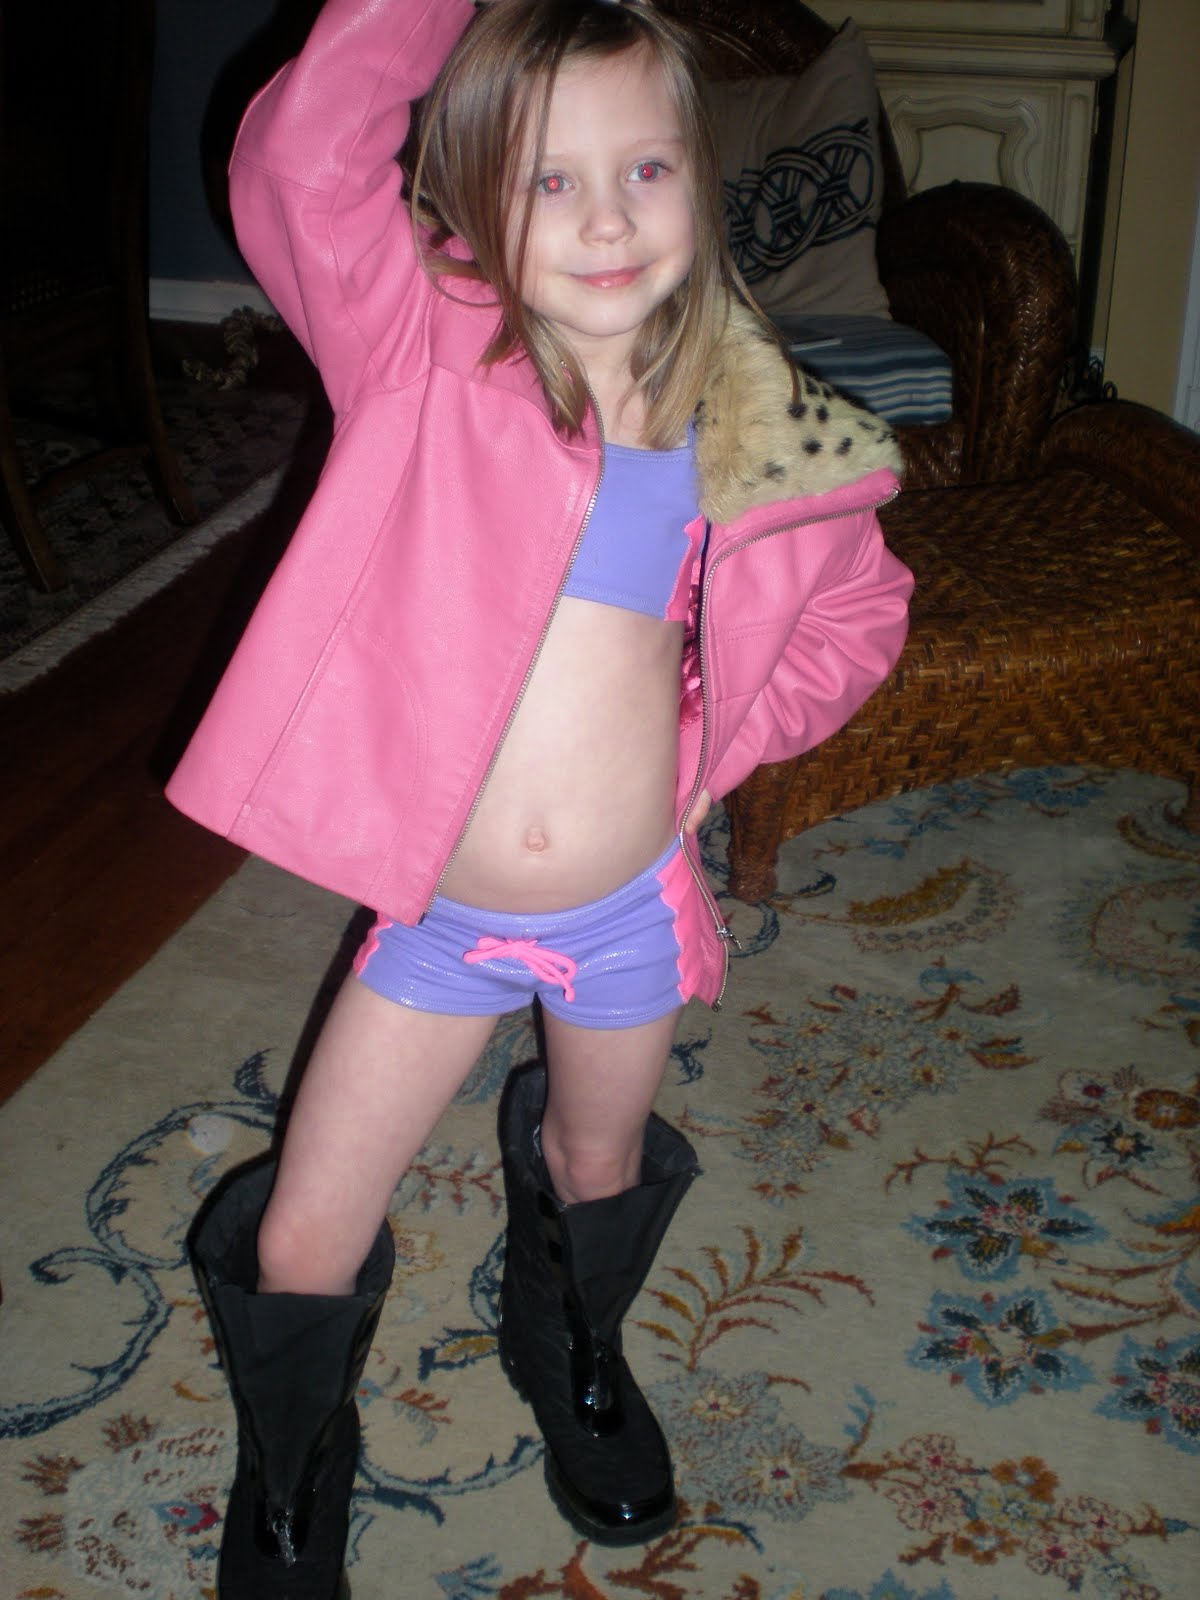 naked teen girl secretly